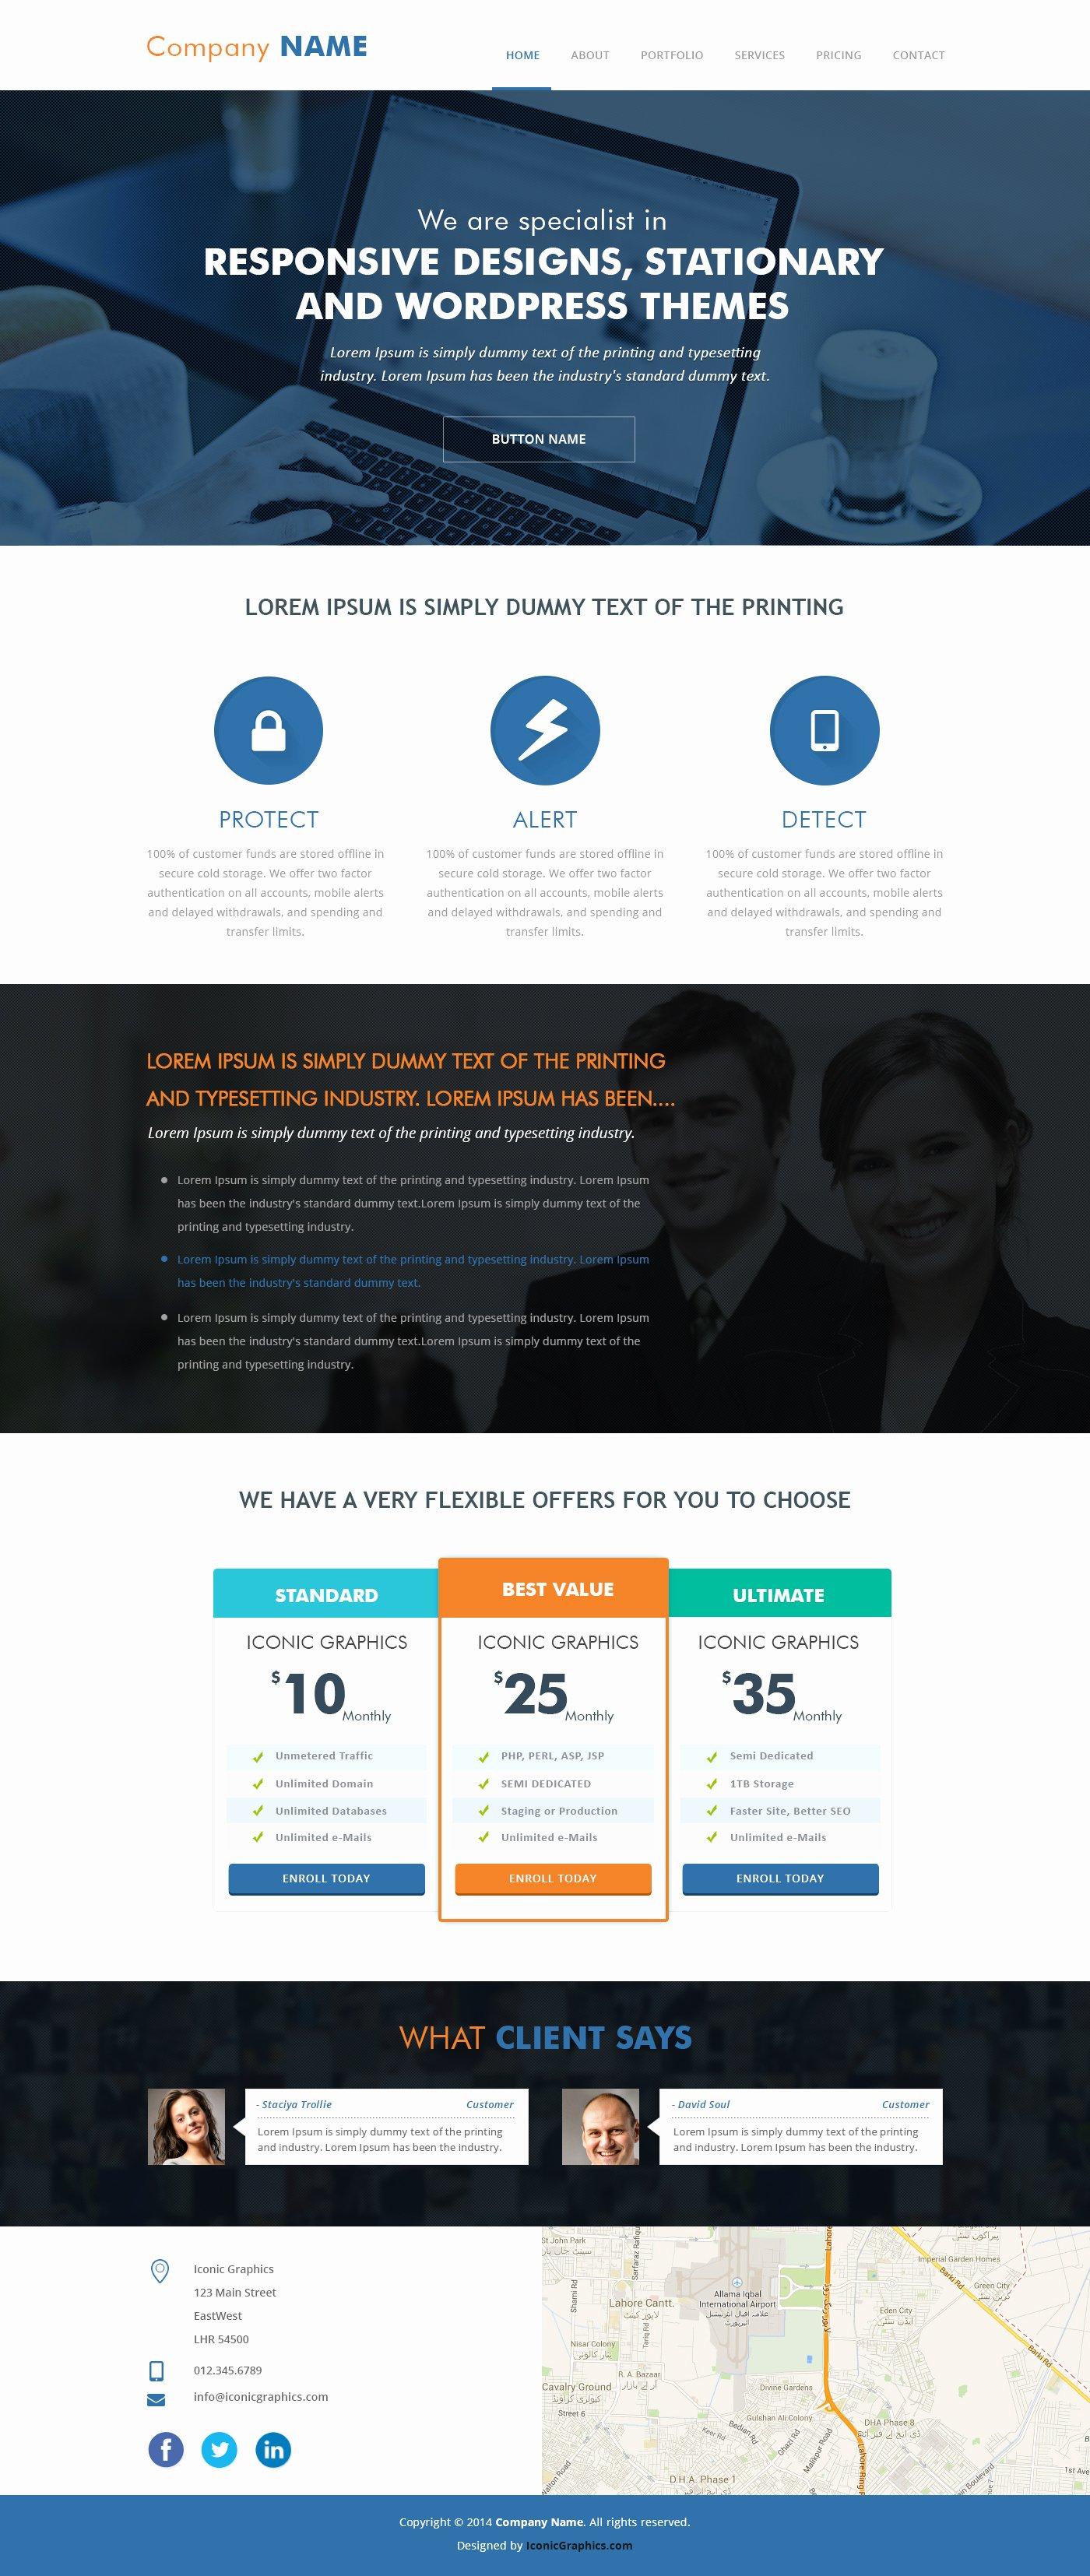 Parallax Website Template Free Luxury Parallax Psd Template